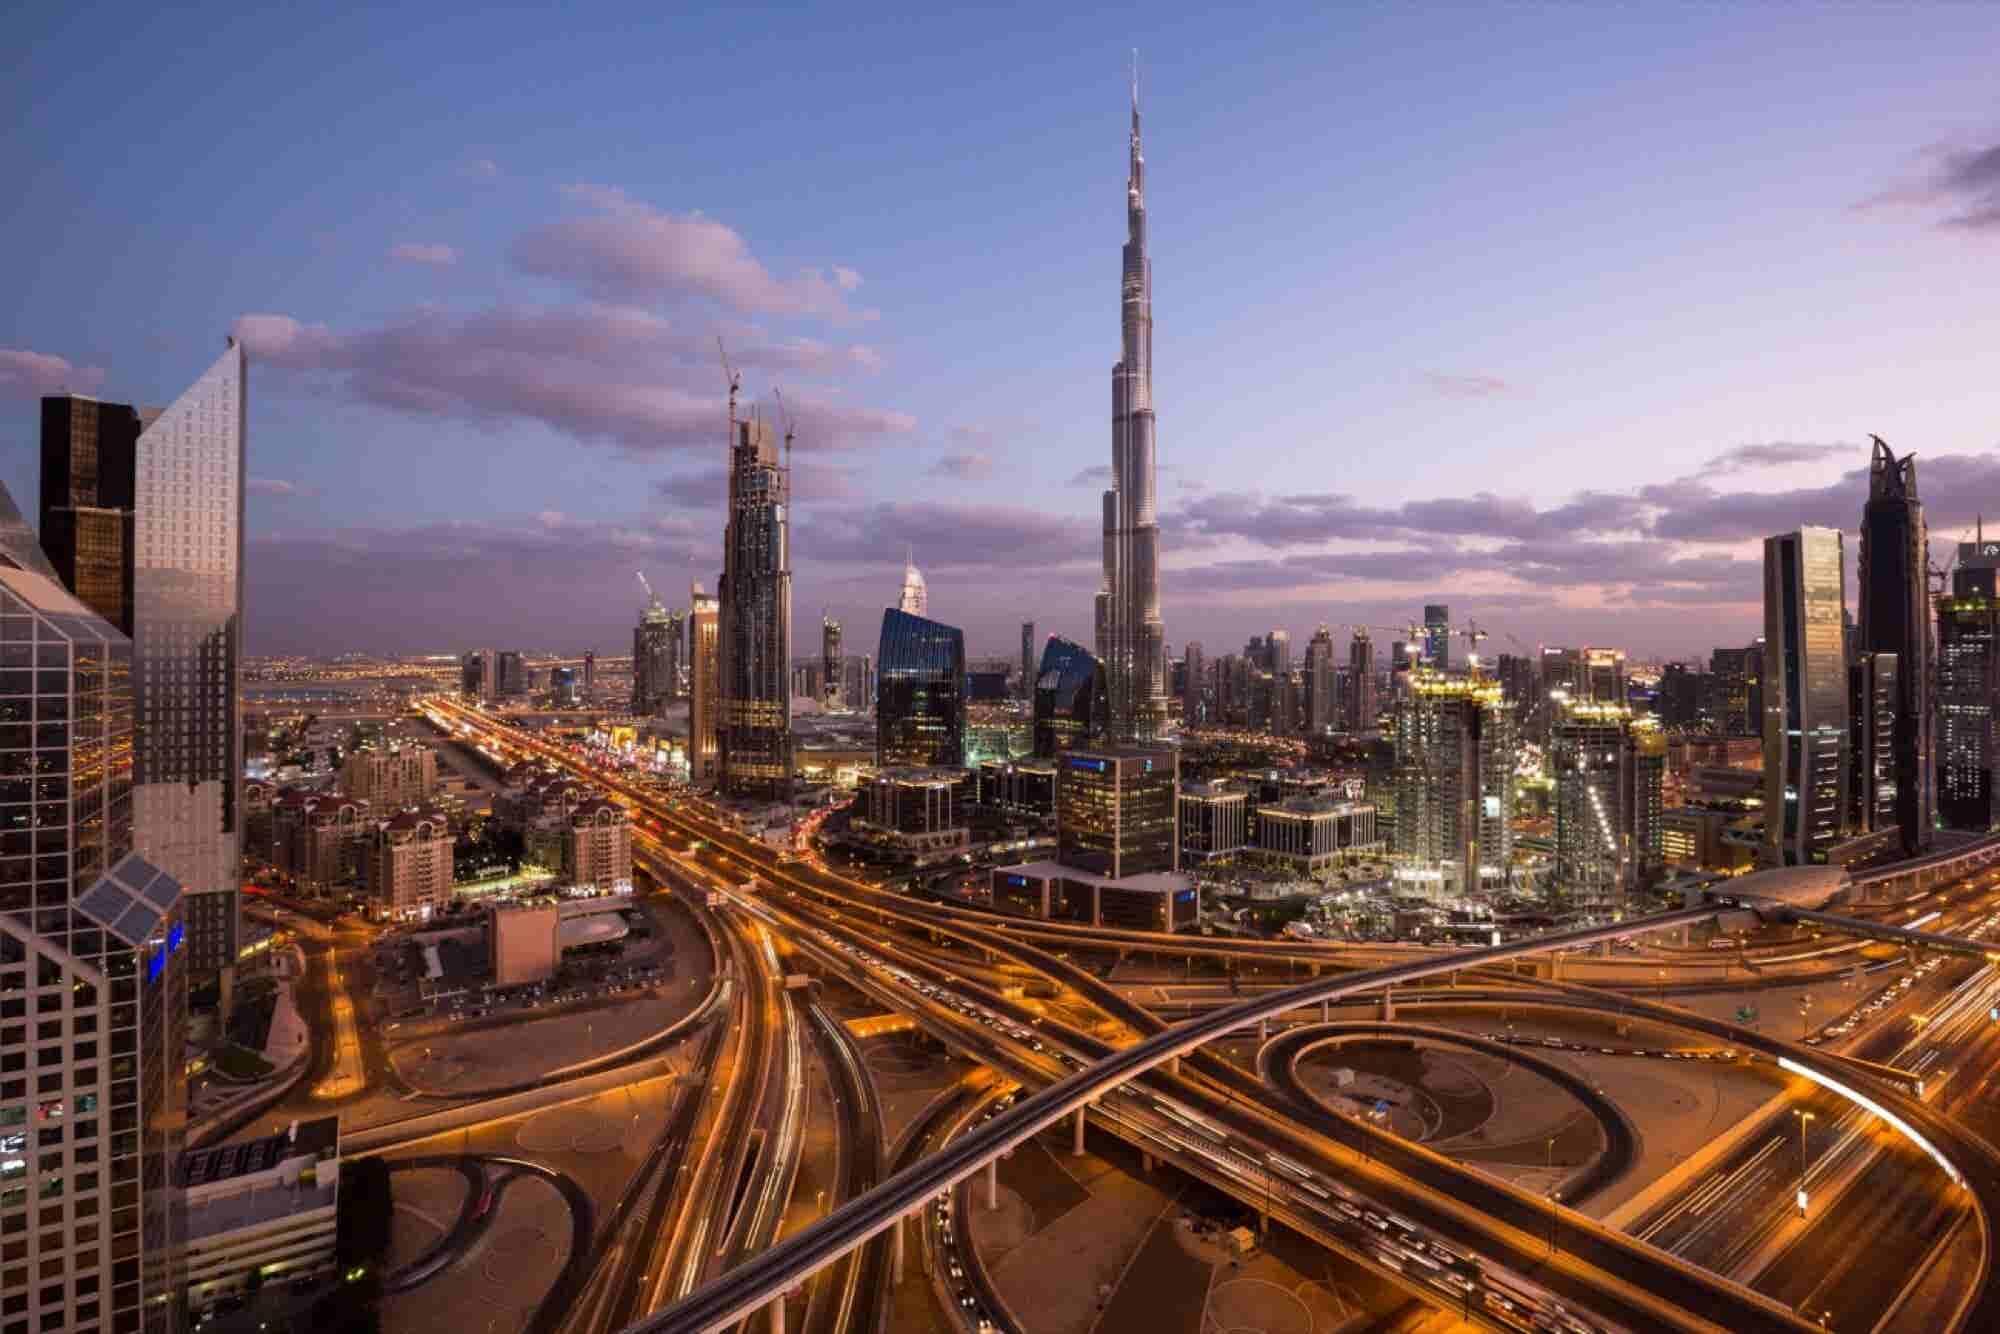 Dubai Startup Hub's Startup Hub Panorama Edition 4.0 Looks Into The Emirate's Funding Landscape For Entrepreneurs